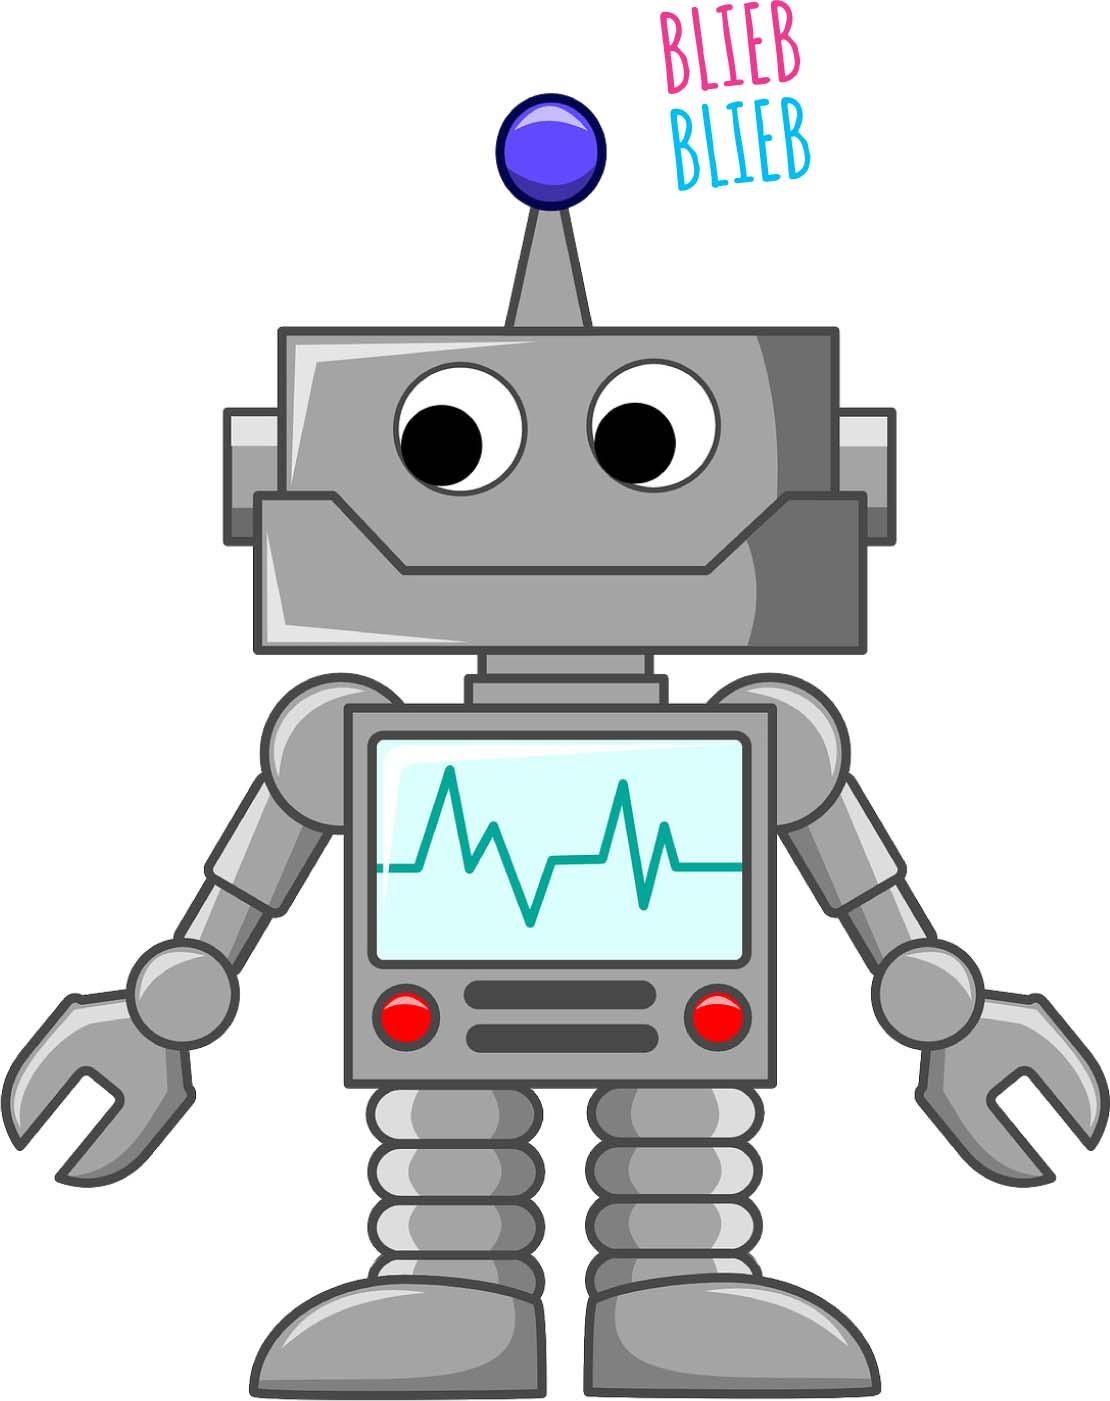 https://static-content.springer.com/image/art%3A10.1007%2Fs41189-018-0314-z/MediaObjects/41189_2018_314_Fig4_HTML.jpg